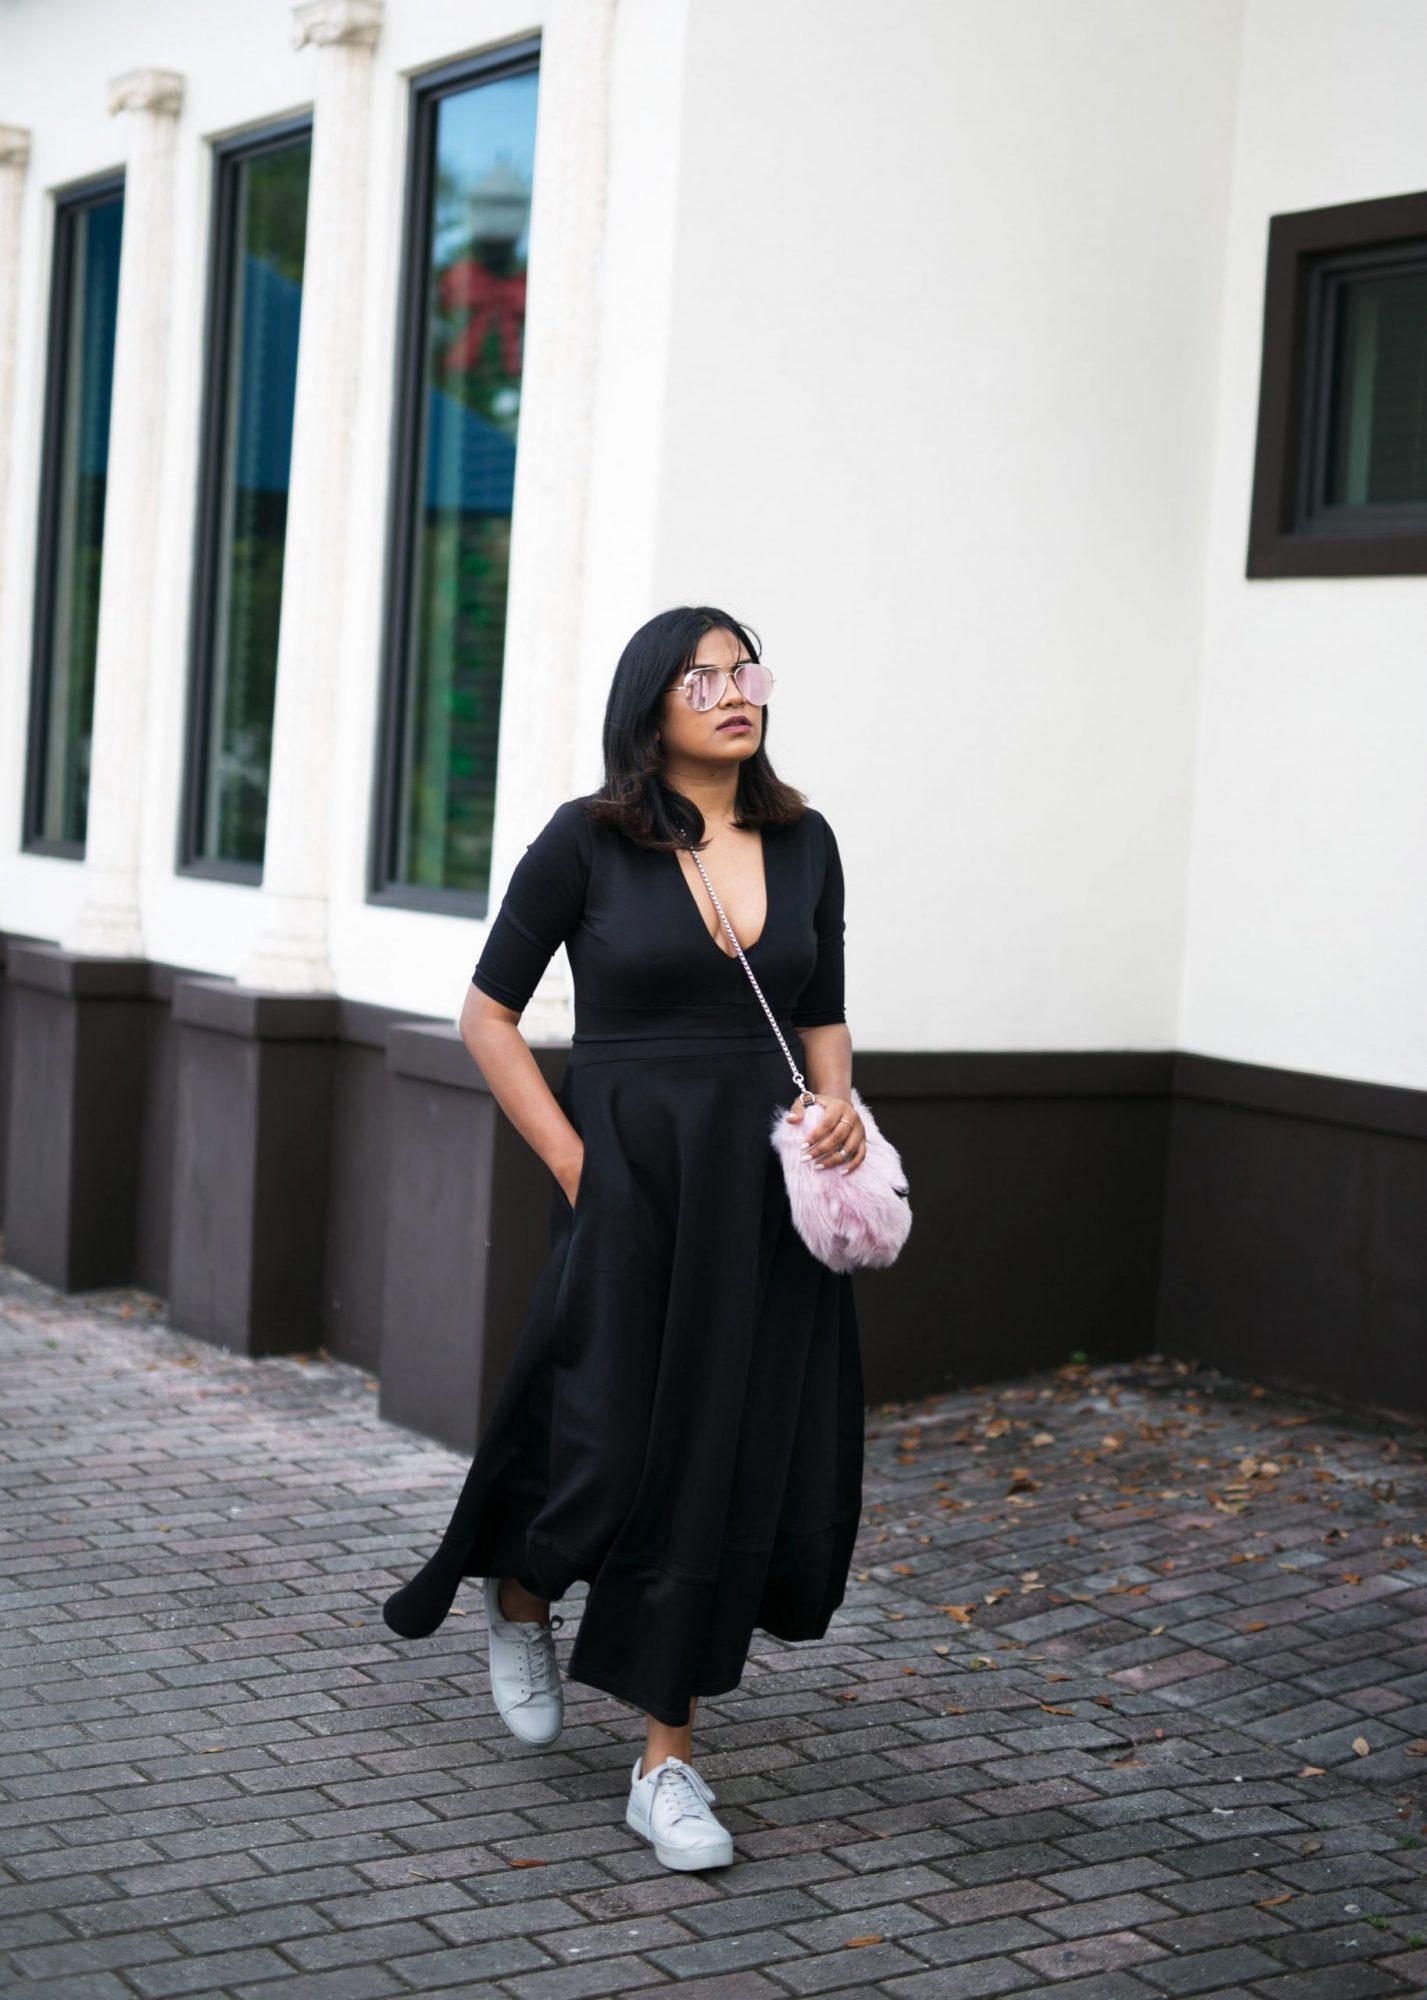 Miami Fashion Street Style Long Black Dress